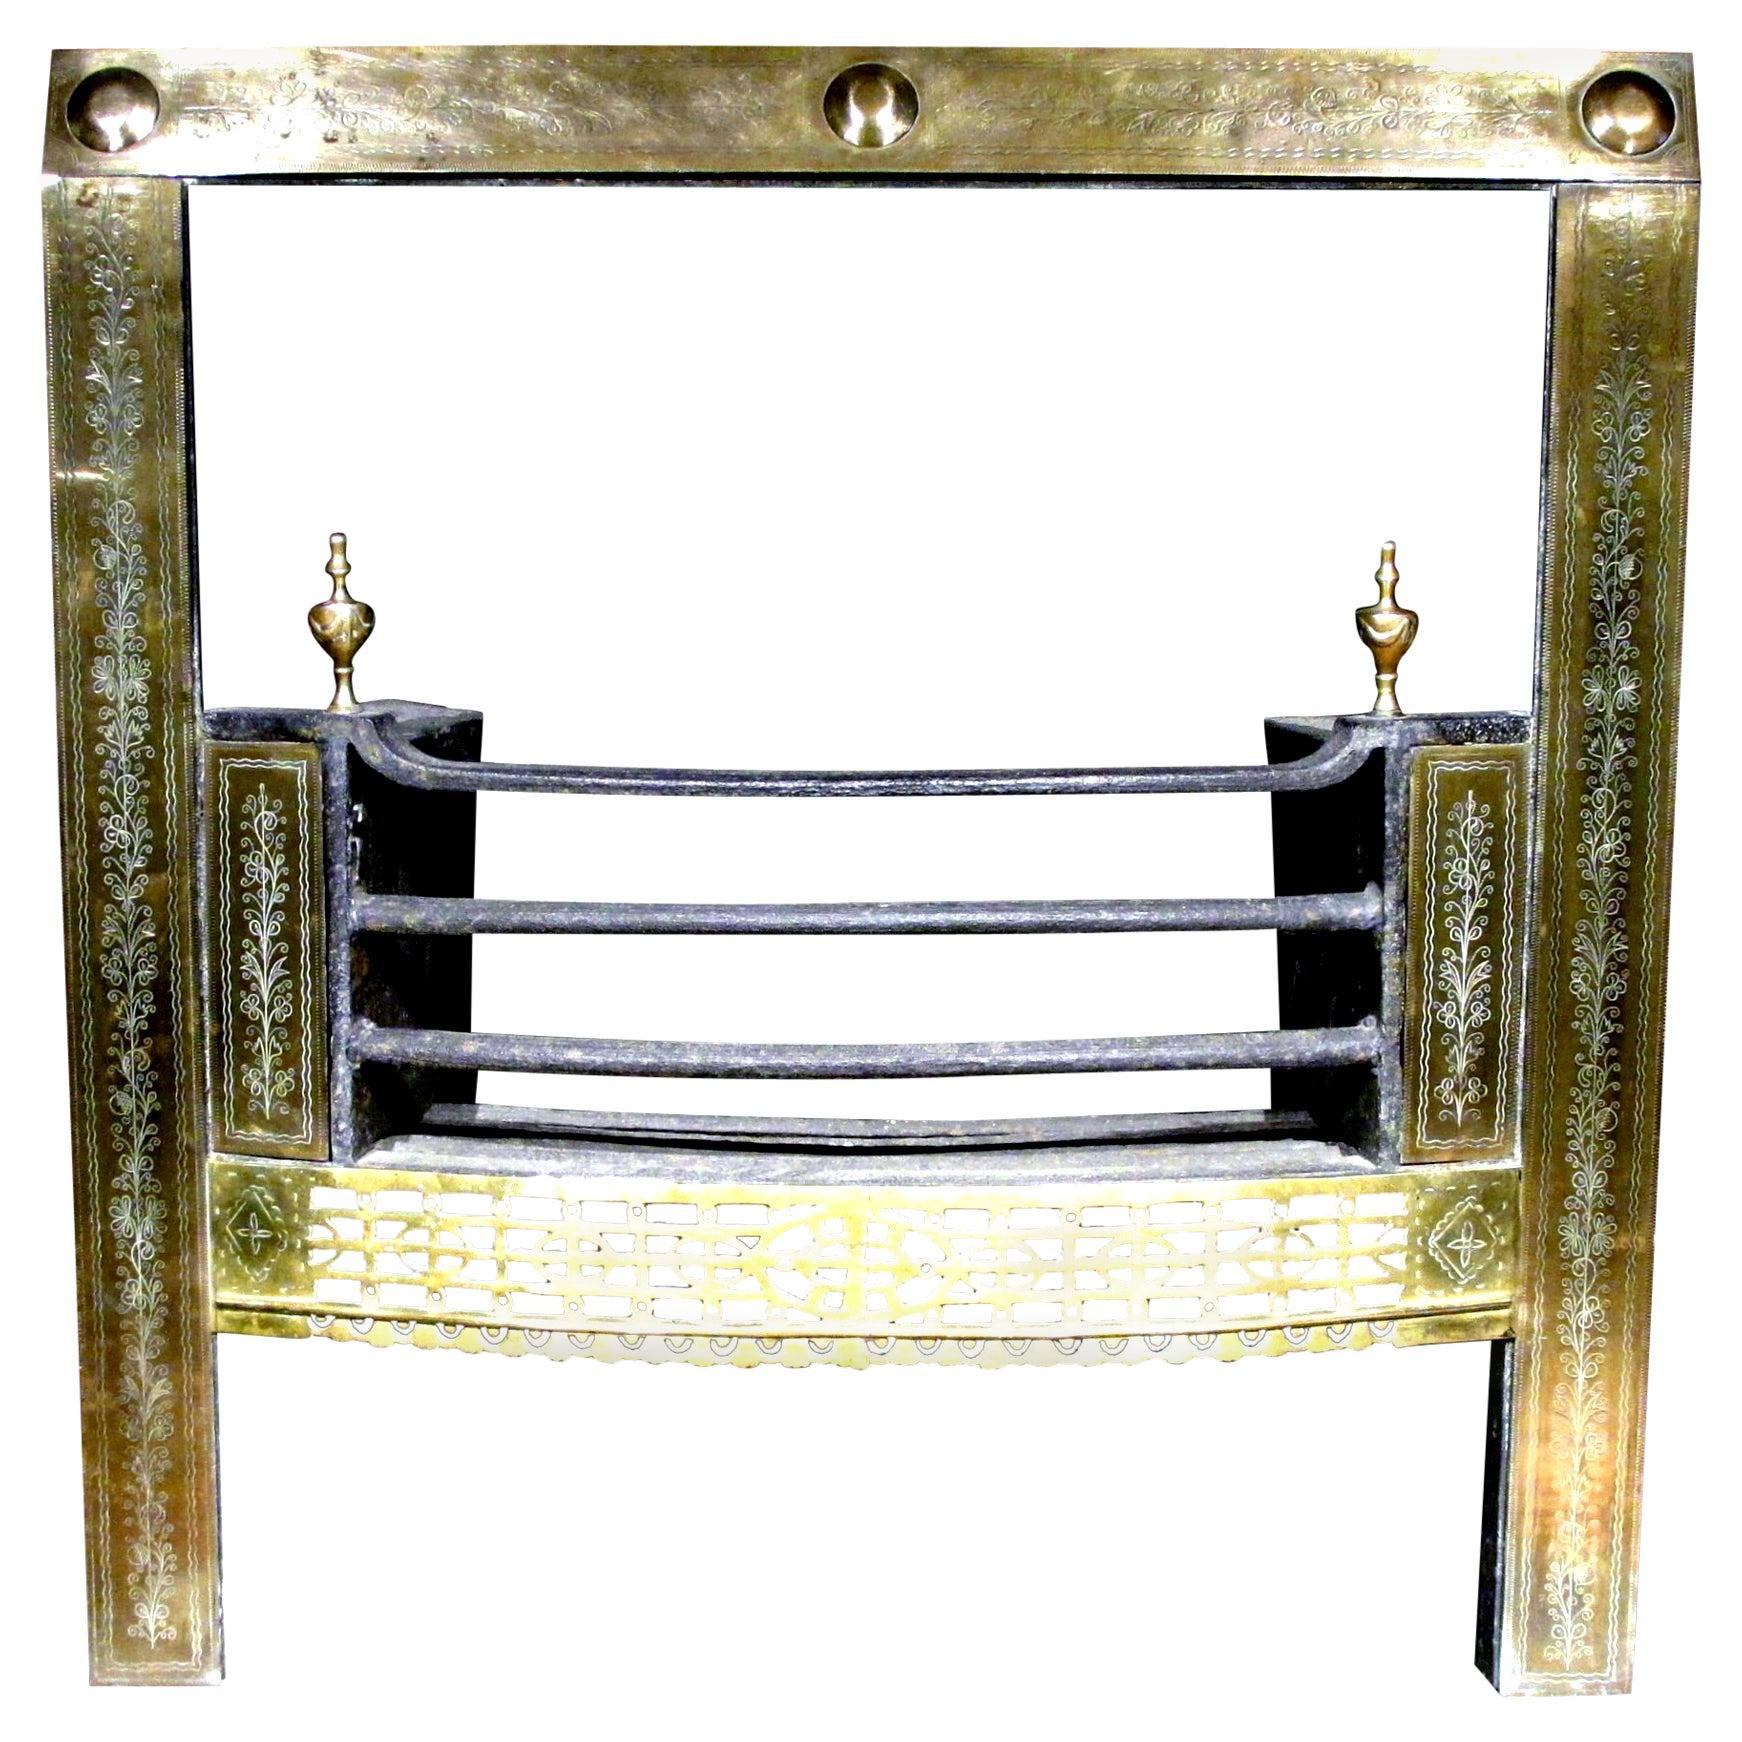 Exceptionally Fine Irish Georgian Fireplace Brass Register Grate, Circa 1780